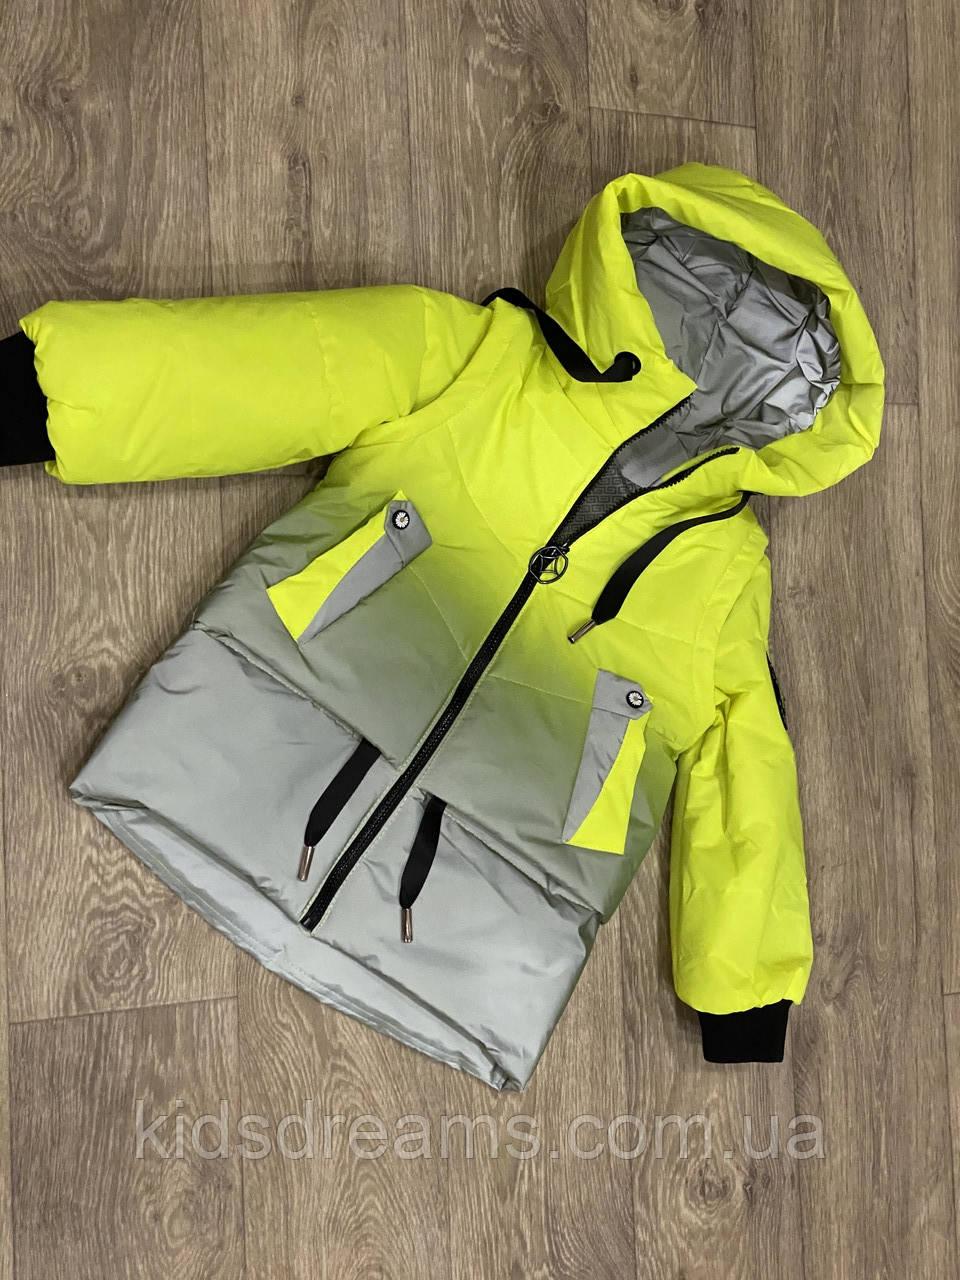 Светоотражающая куртка 128-152 рост